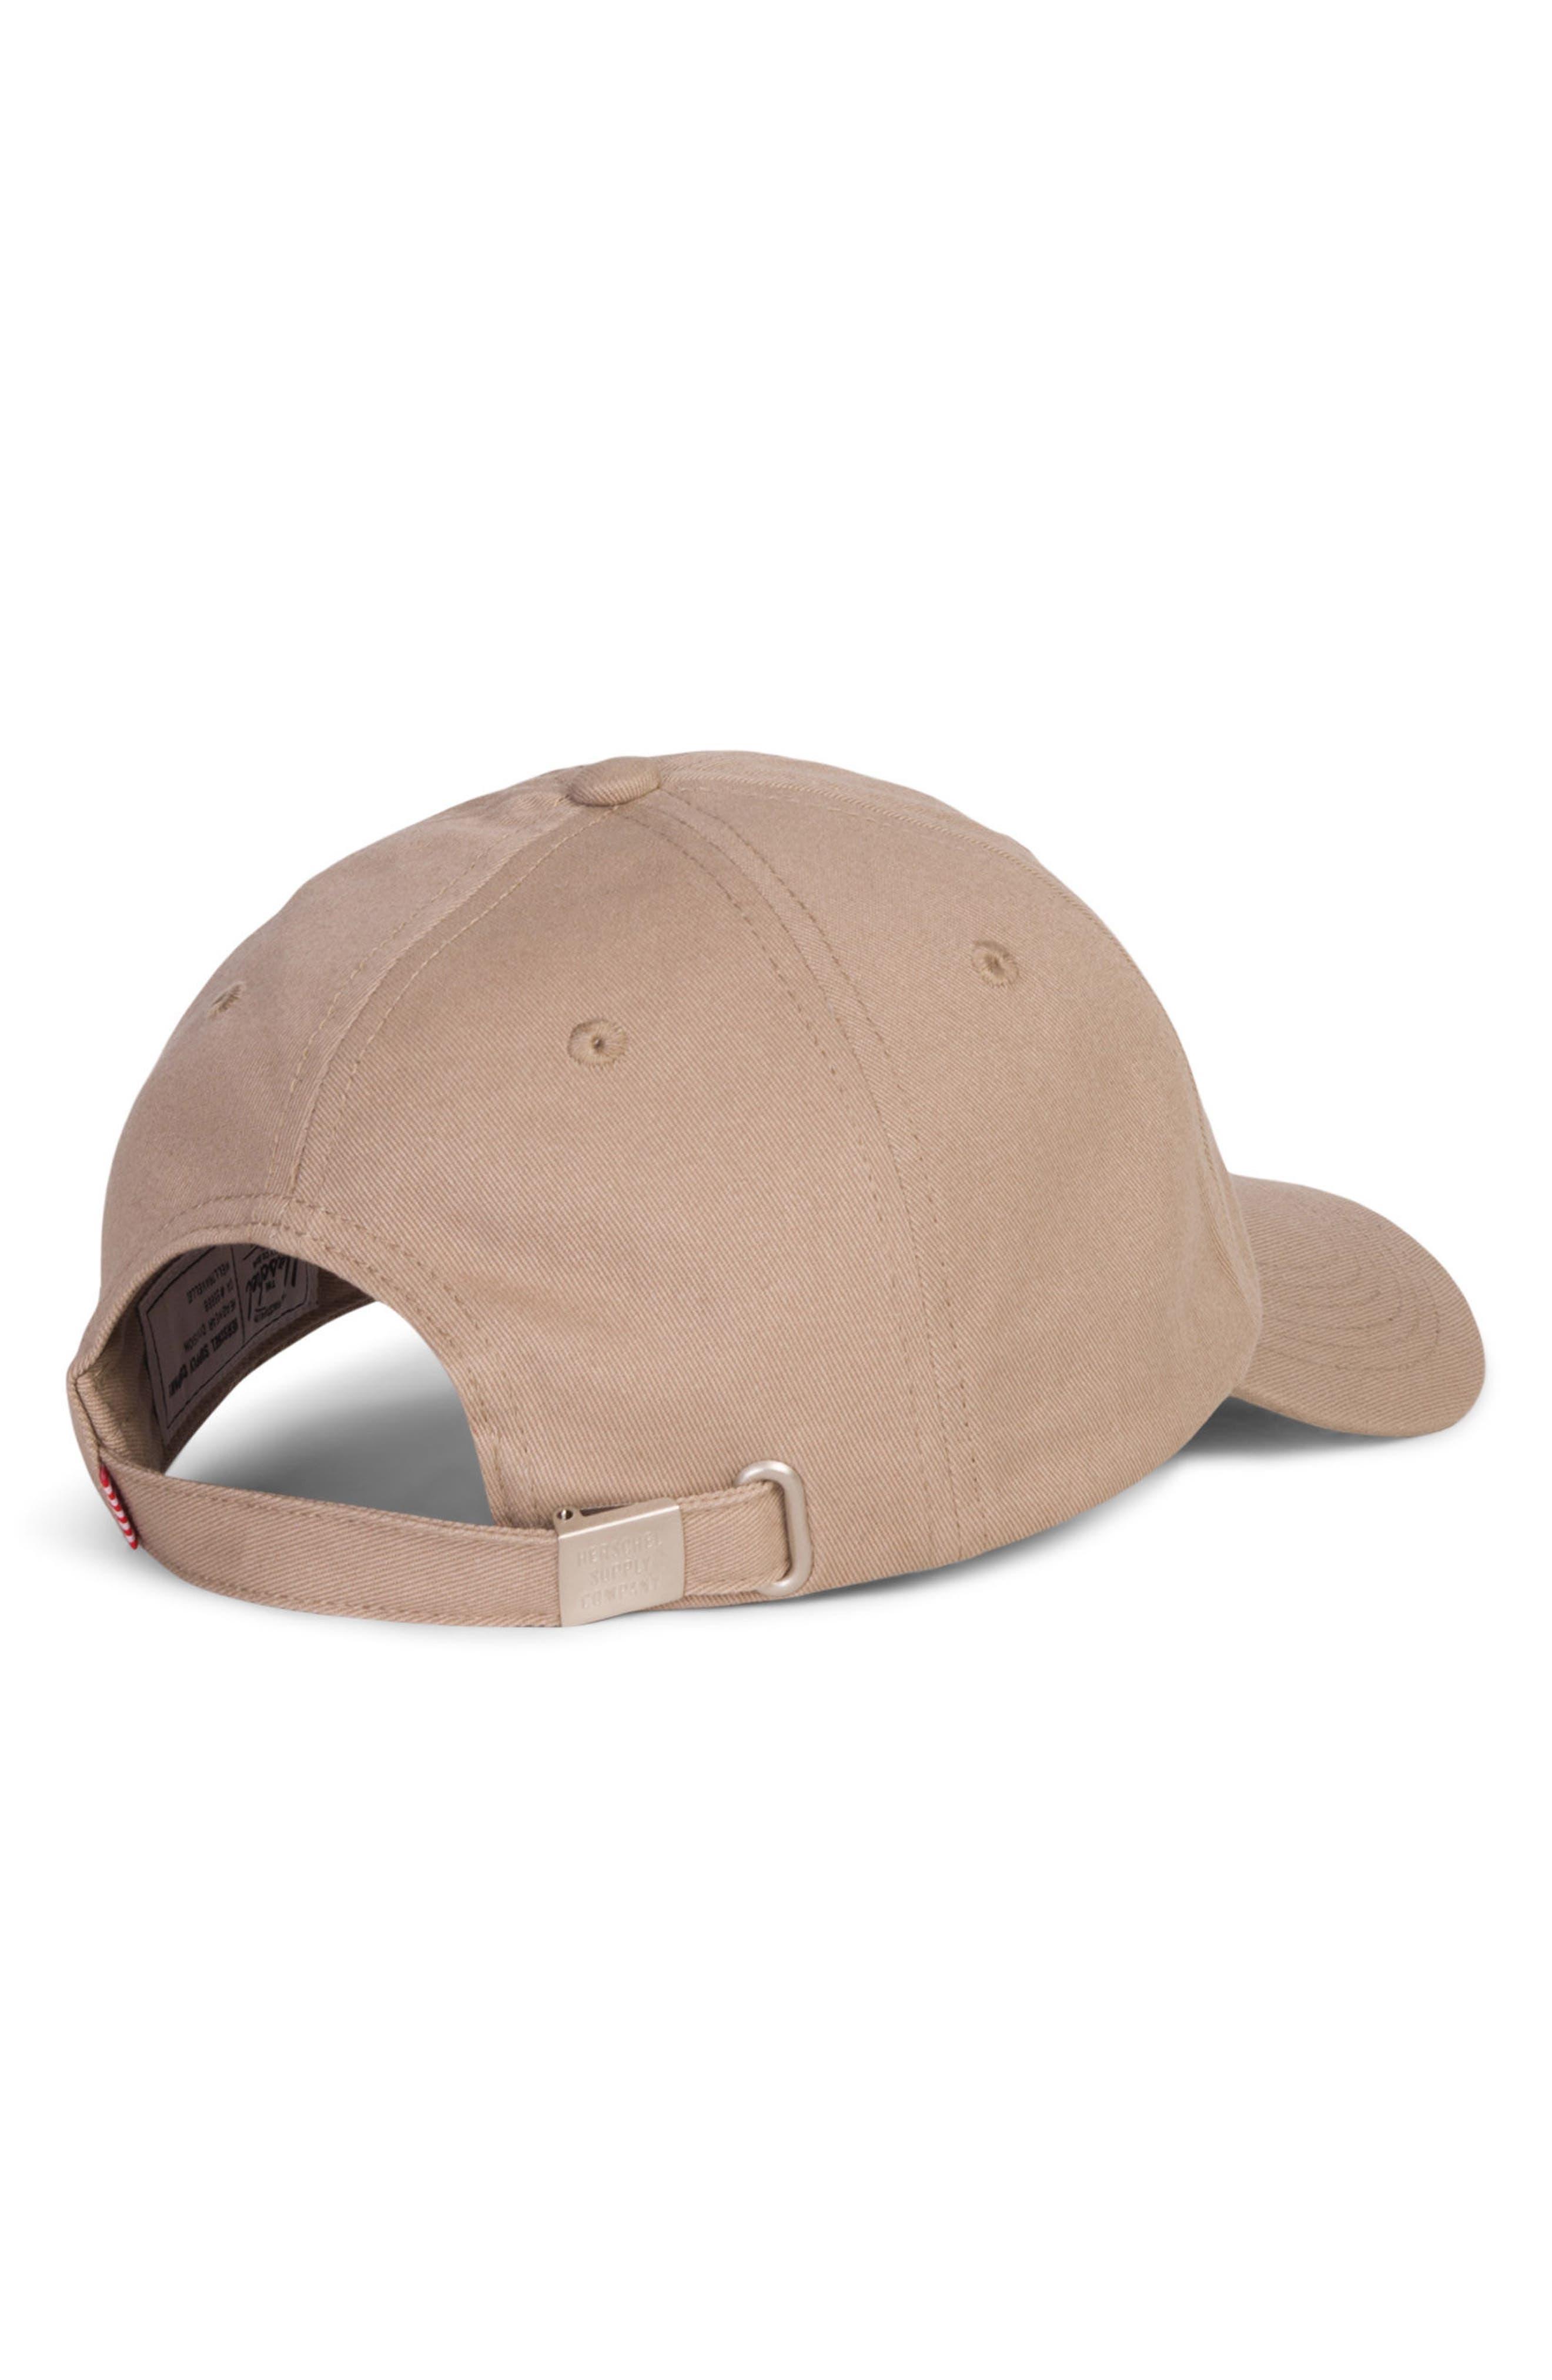 Sylas Baseball Cap,                             Alternate thumbnail 2, color,                             Khaki